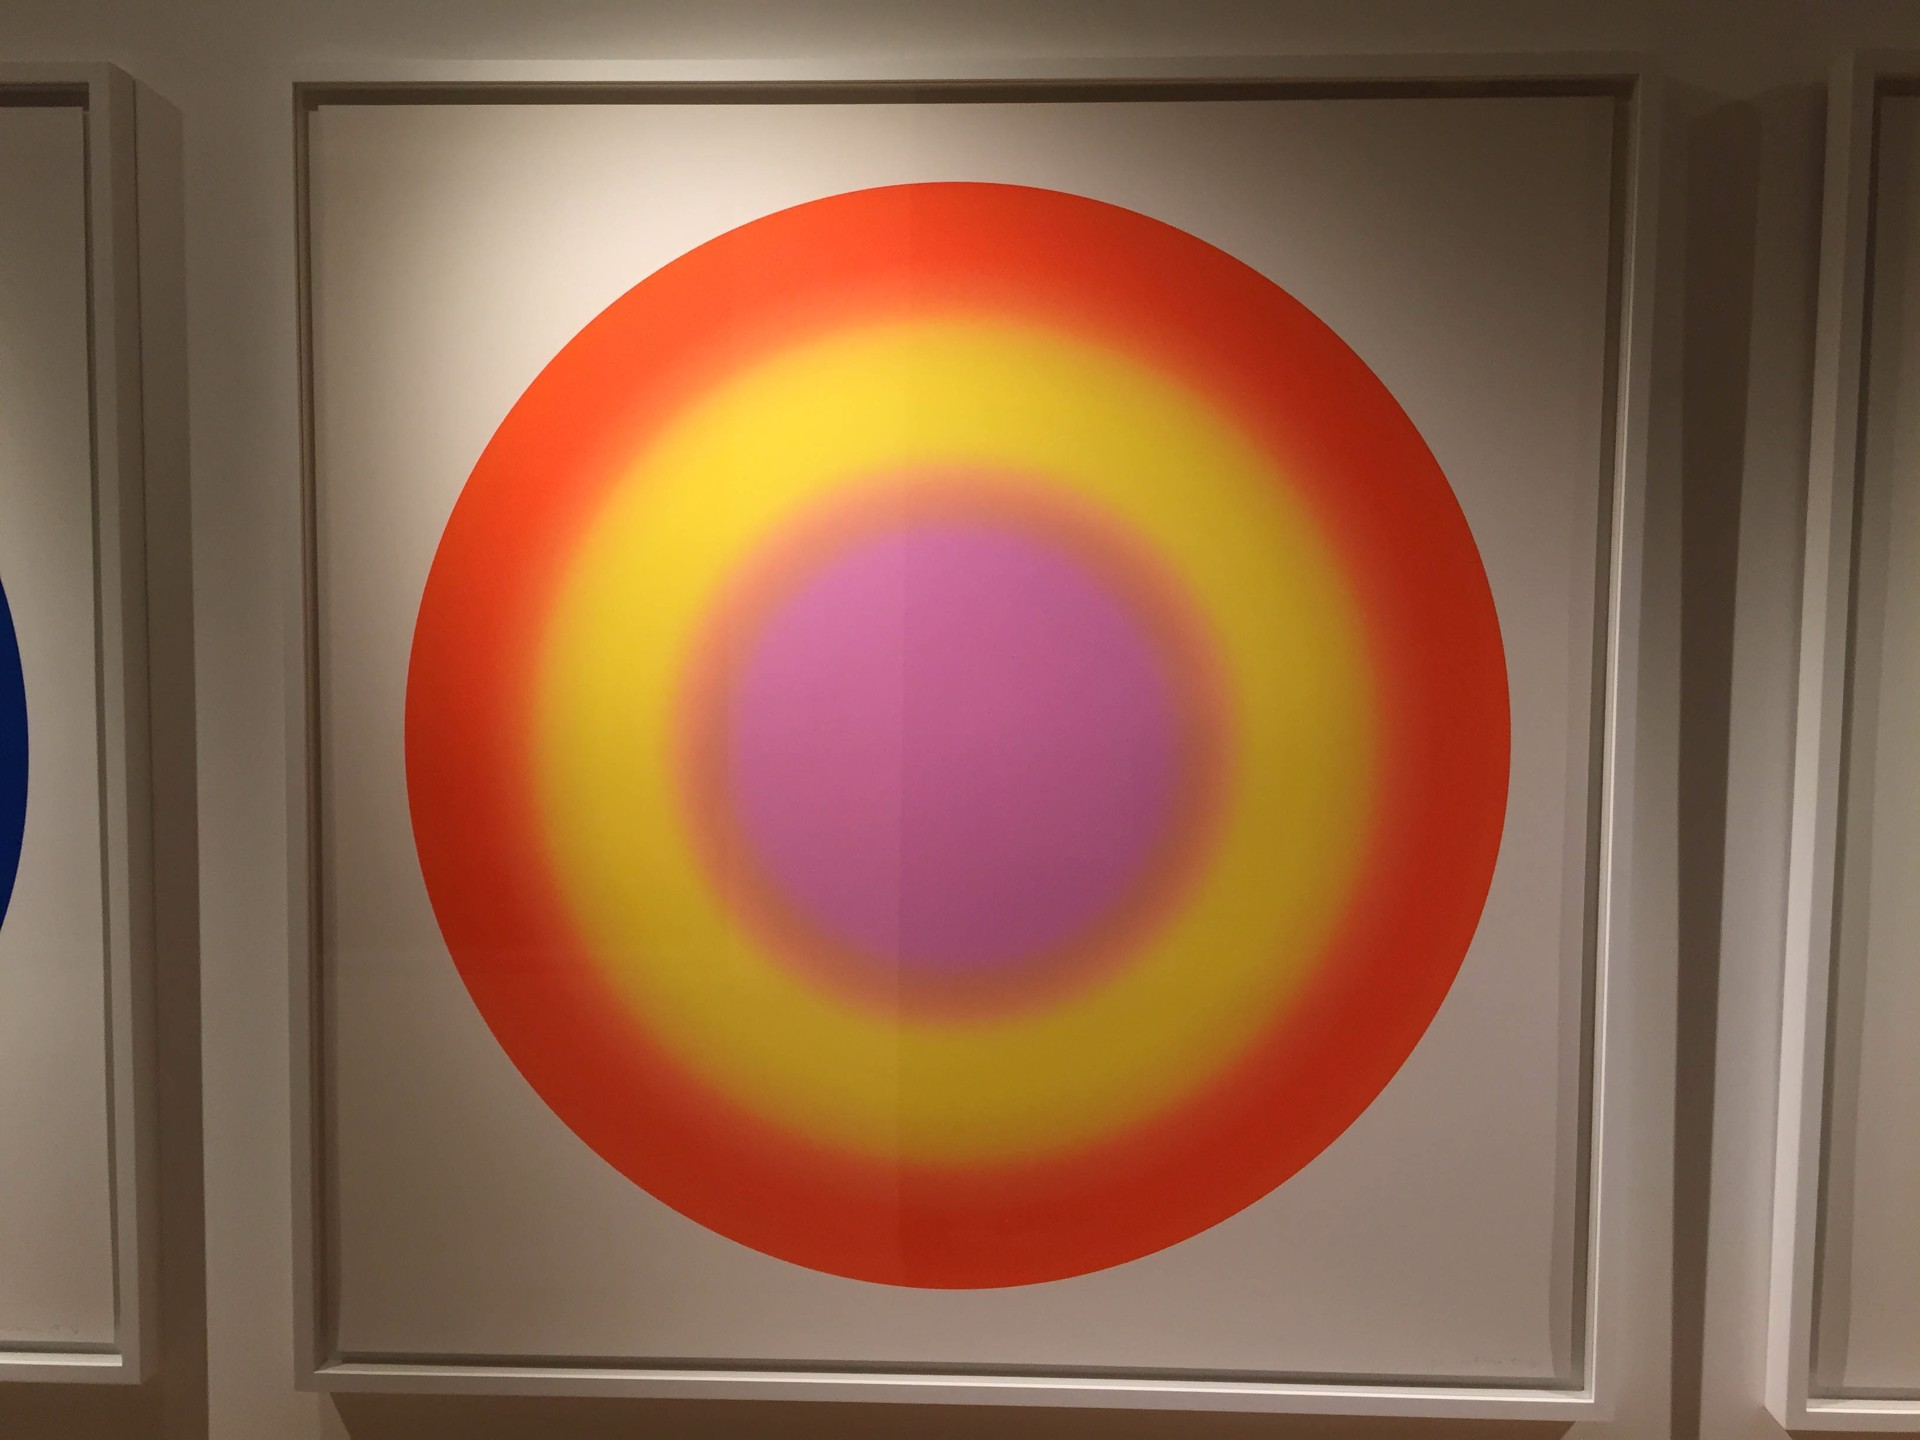 Sun 2 by Ugo Rondinone